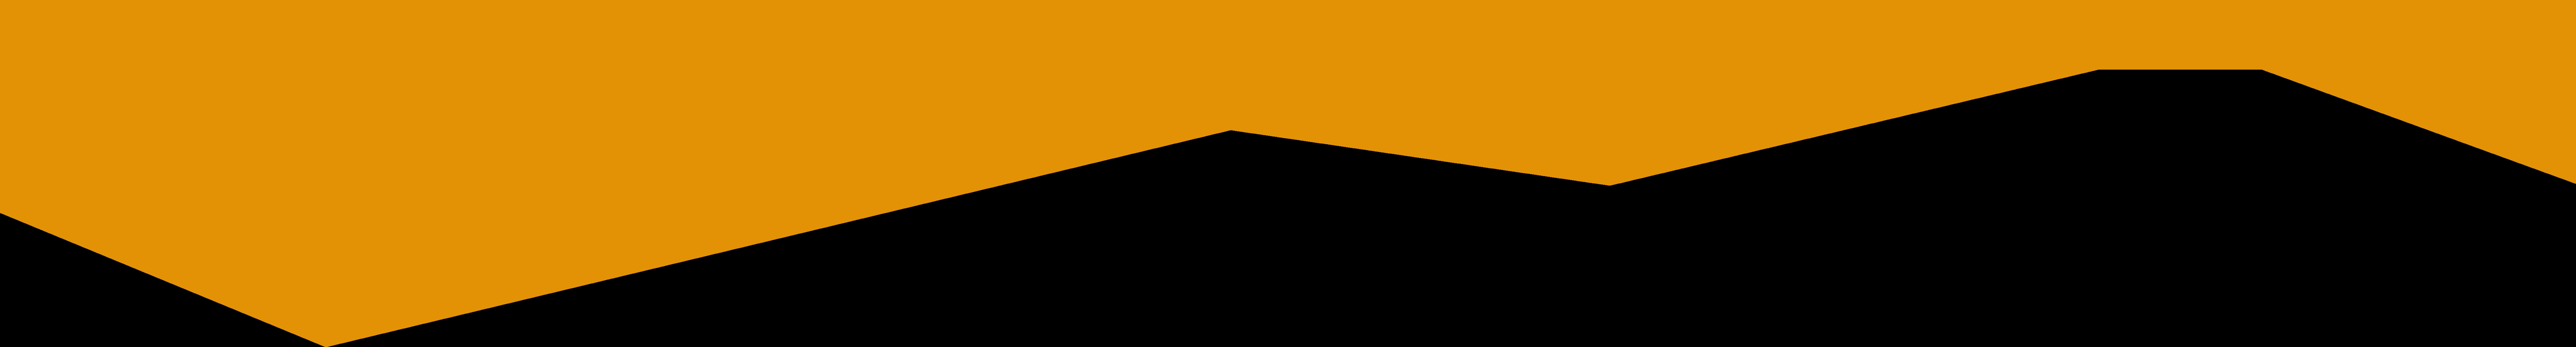 NovelIP Divider Orange Bottom